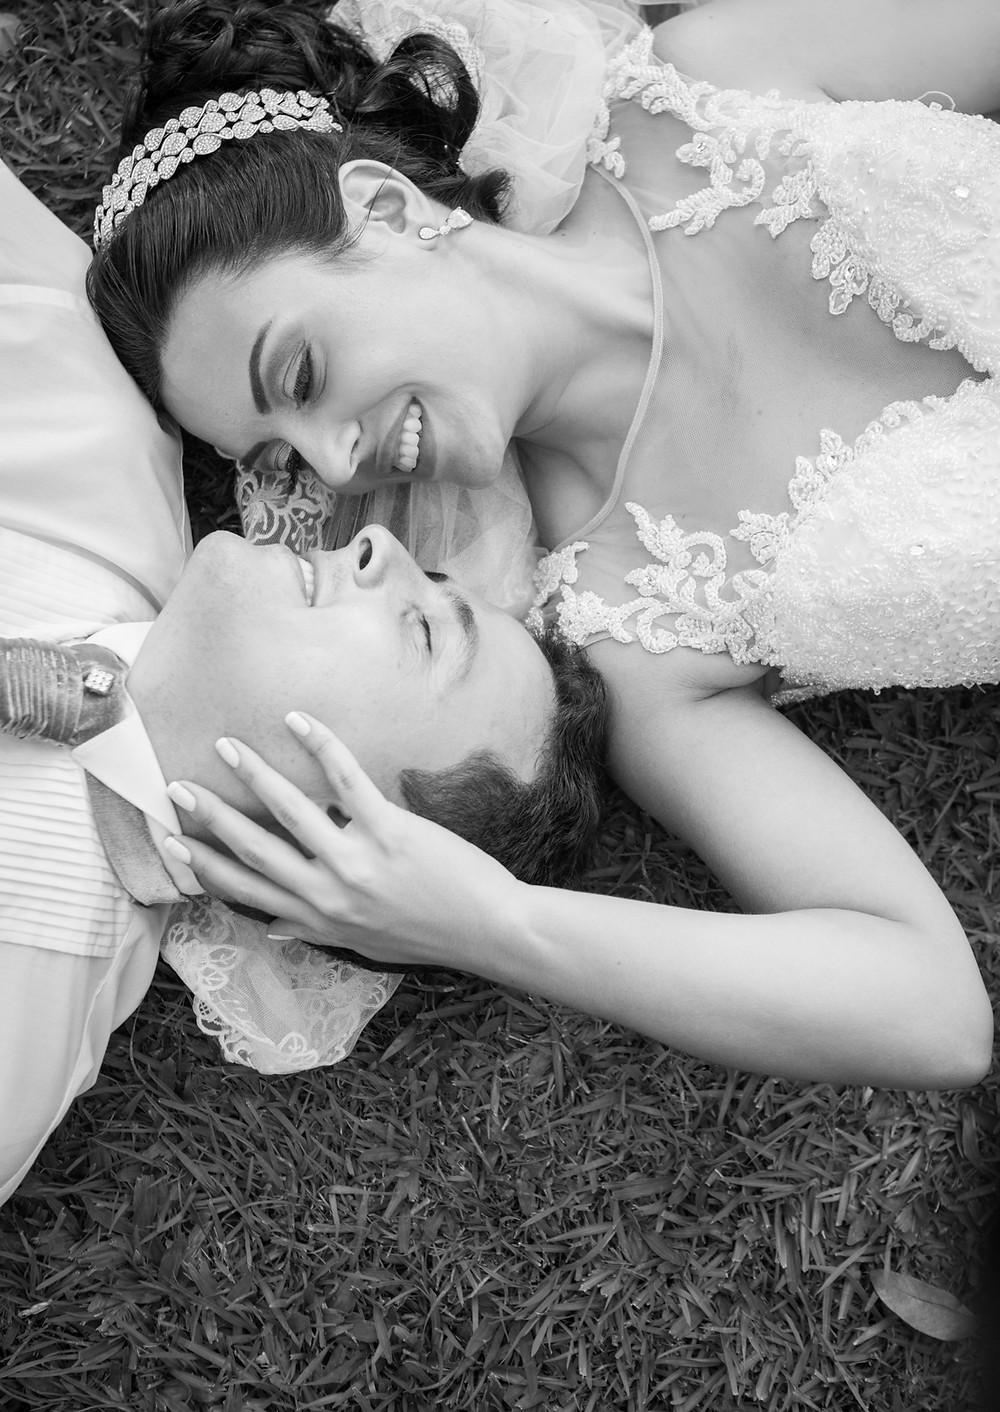 wolf wagner fotografo casamento belo horizonte making of noiva noivos casal amor wedding